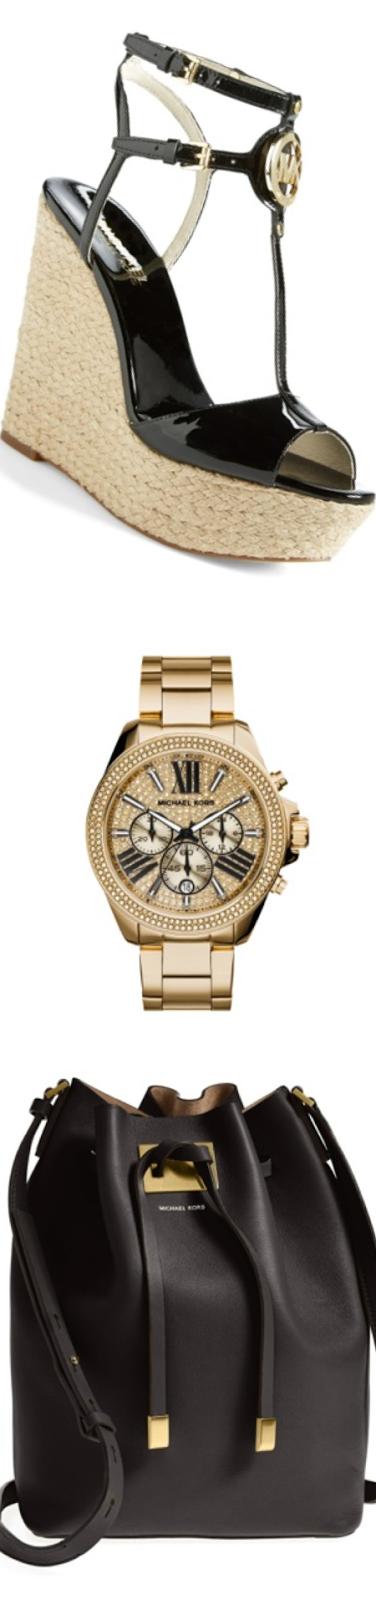 Michael Kors Wren Pave Dial Chronograph Watch